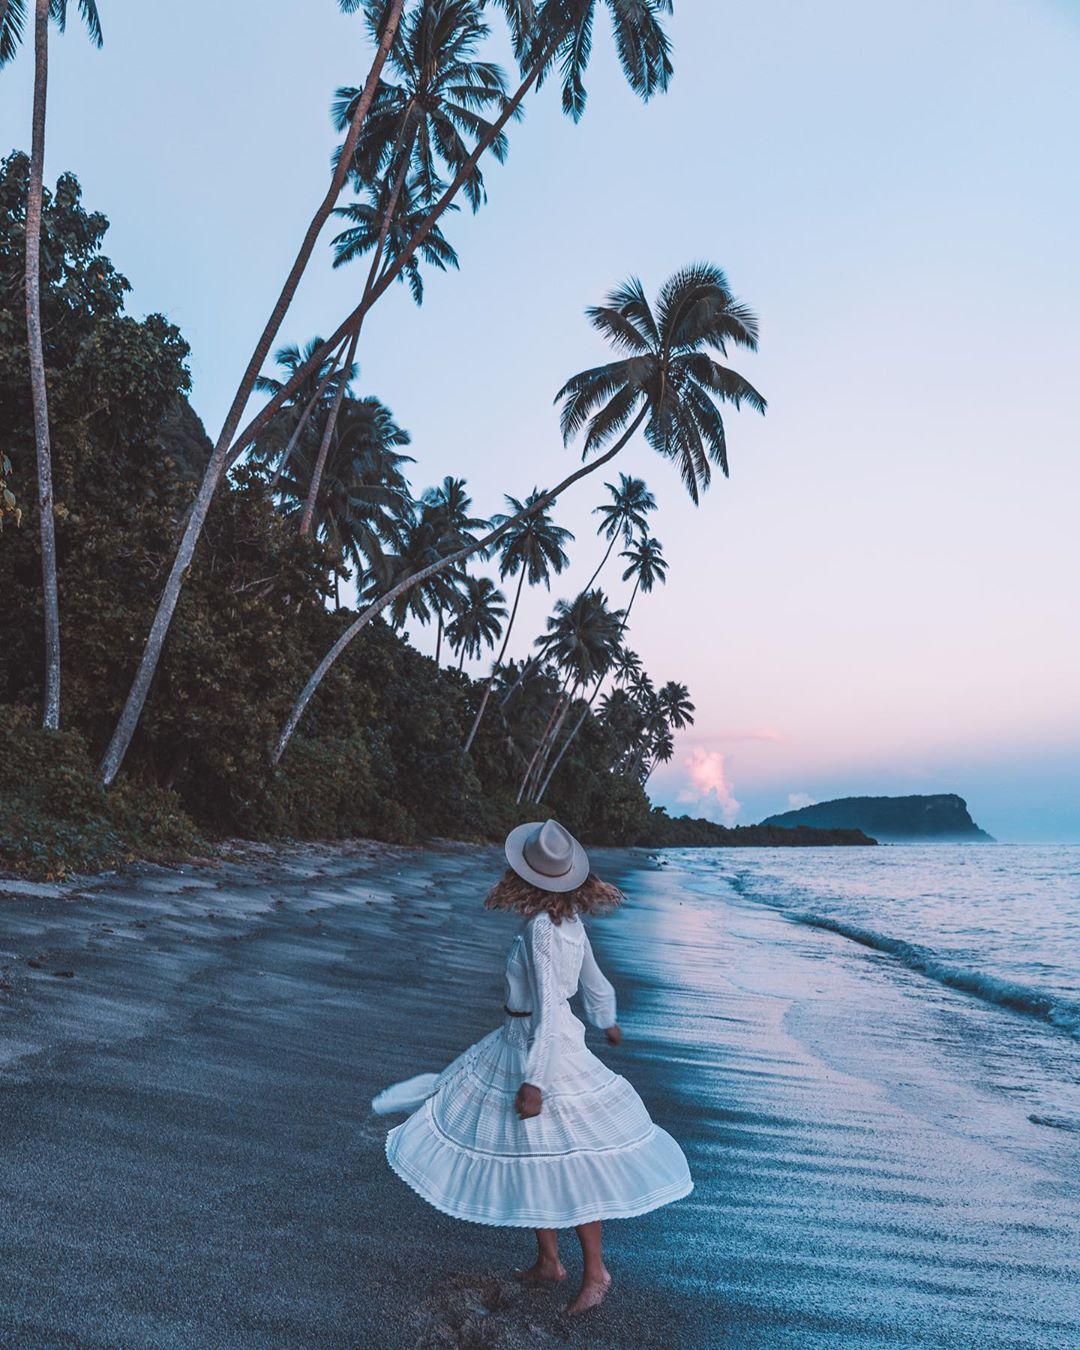 Carmen Huter Travel and Adventure Photographer